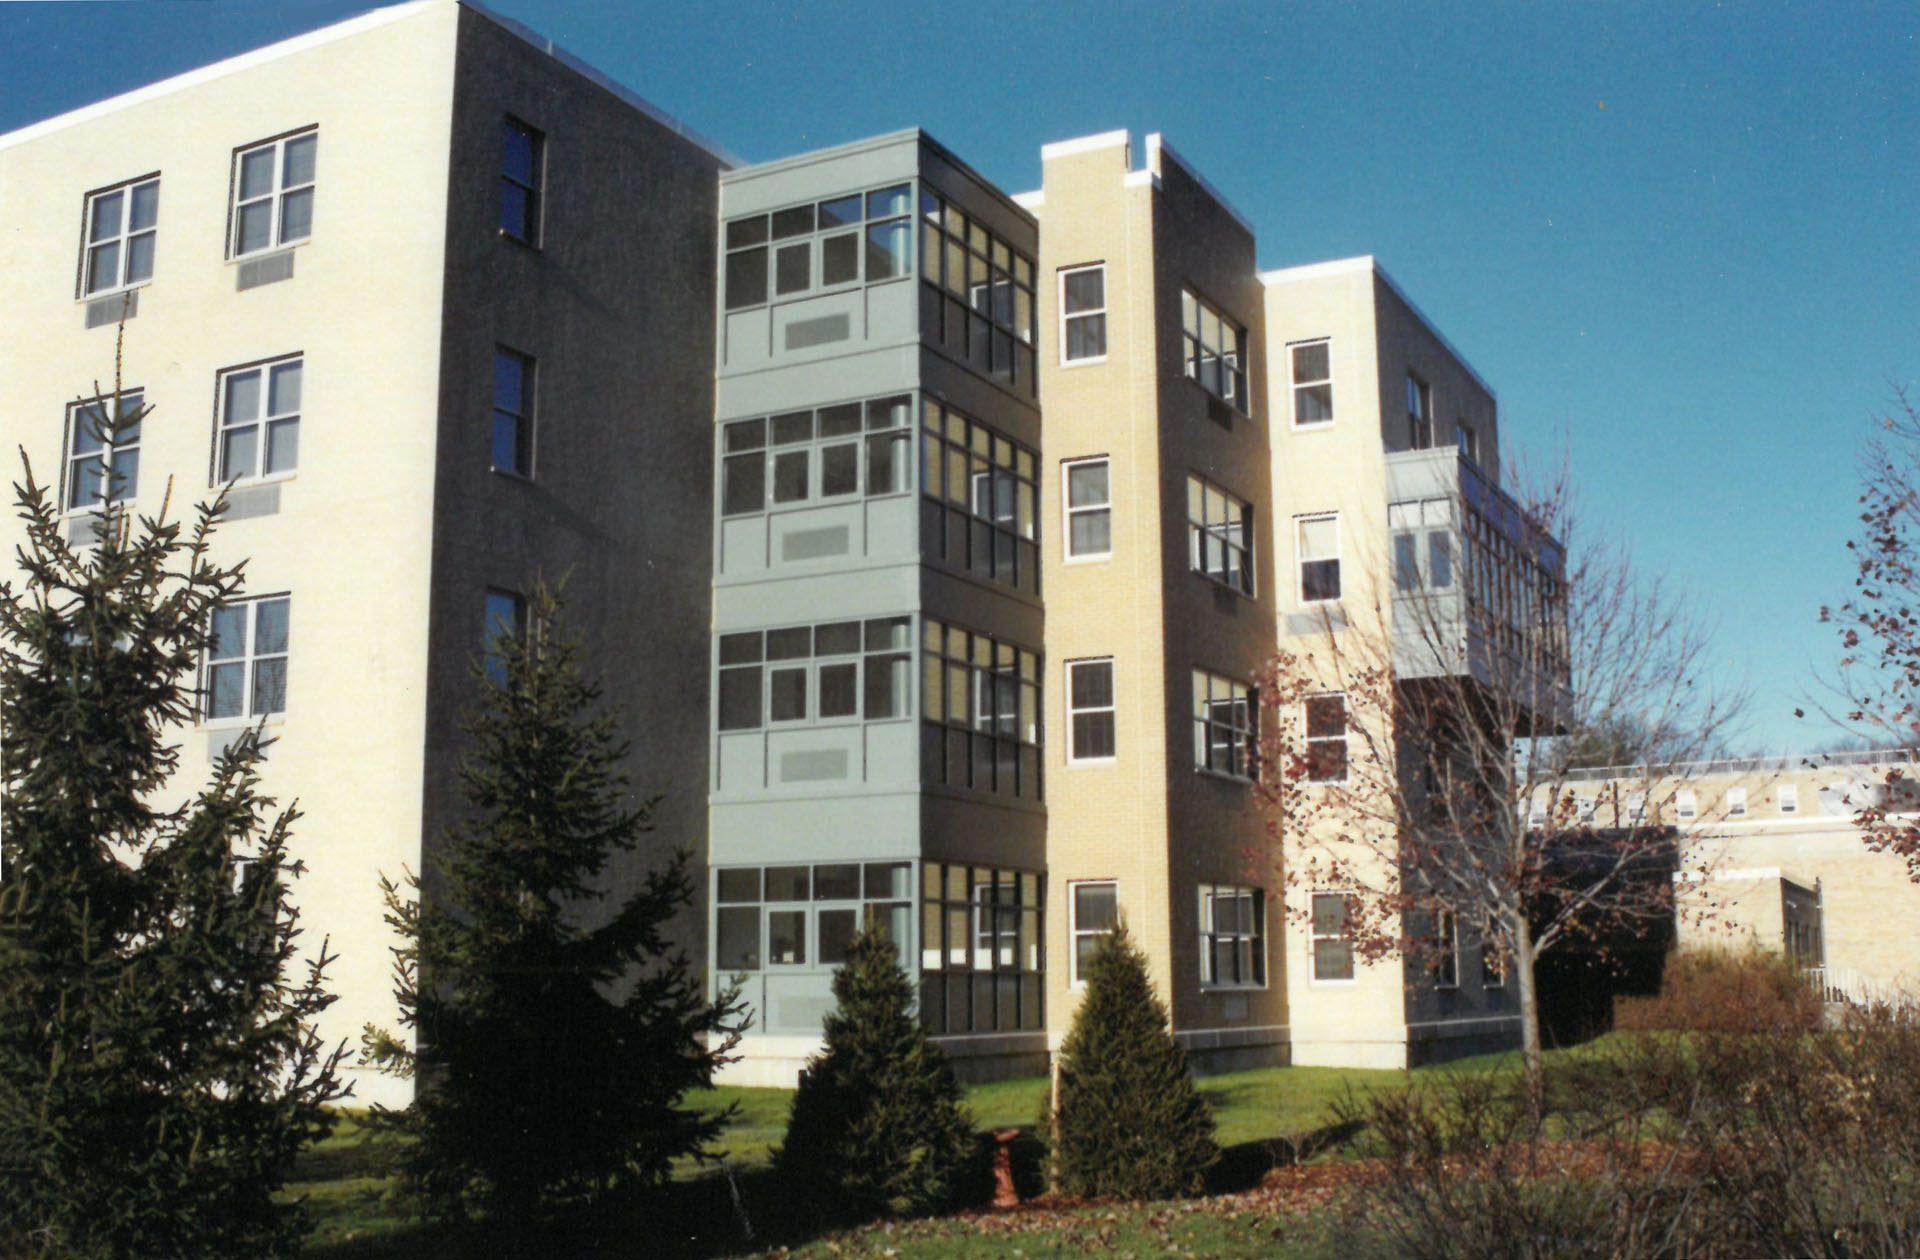 2007 – St. Agnes Residence, Sparkill, NY